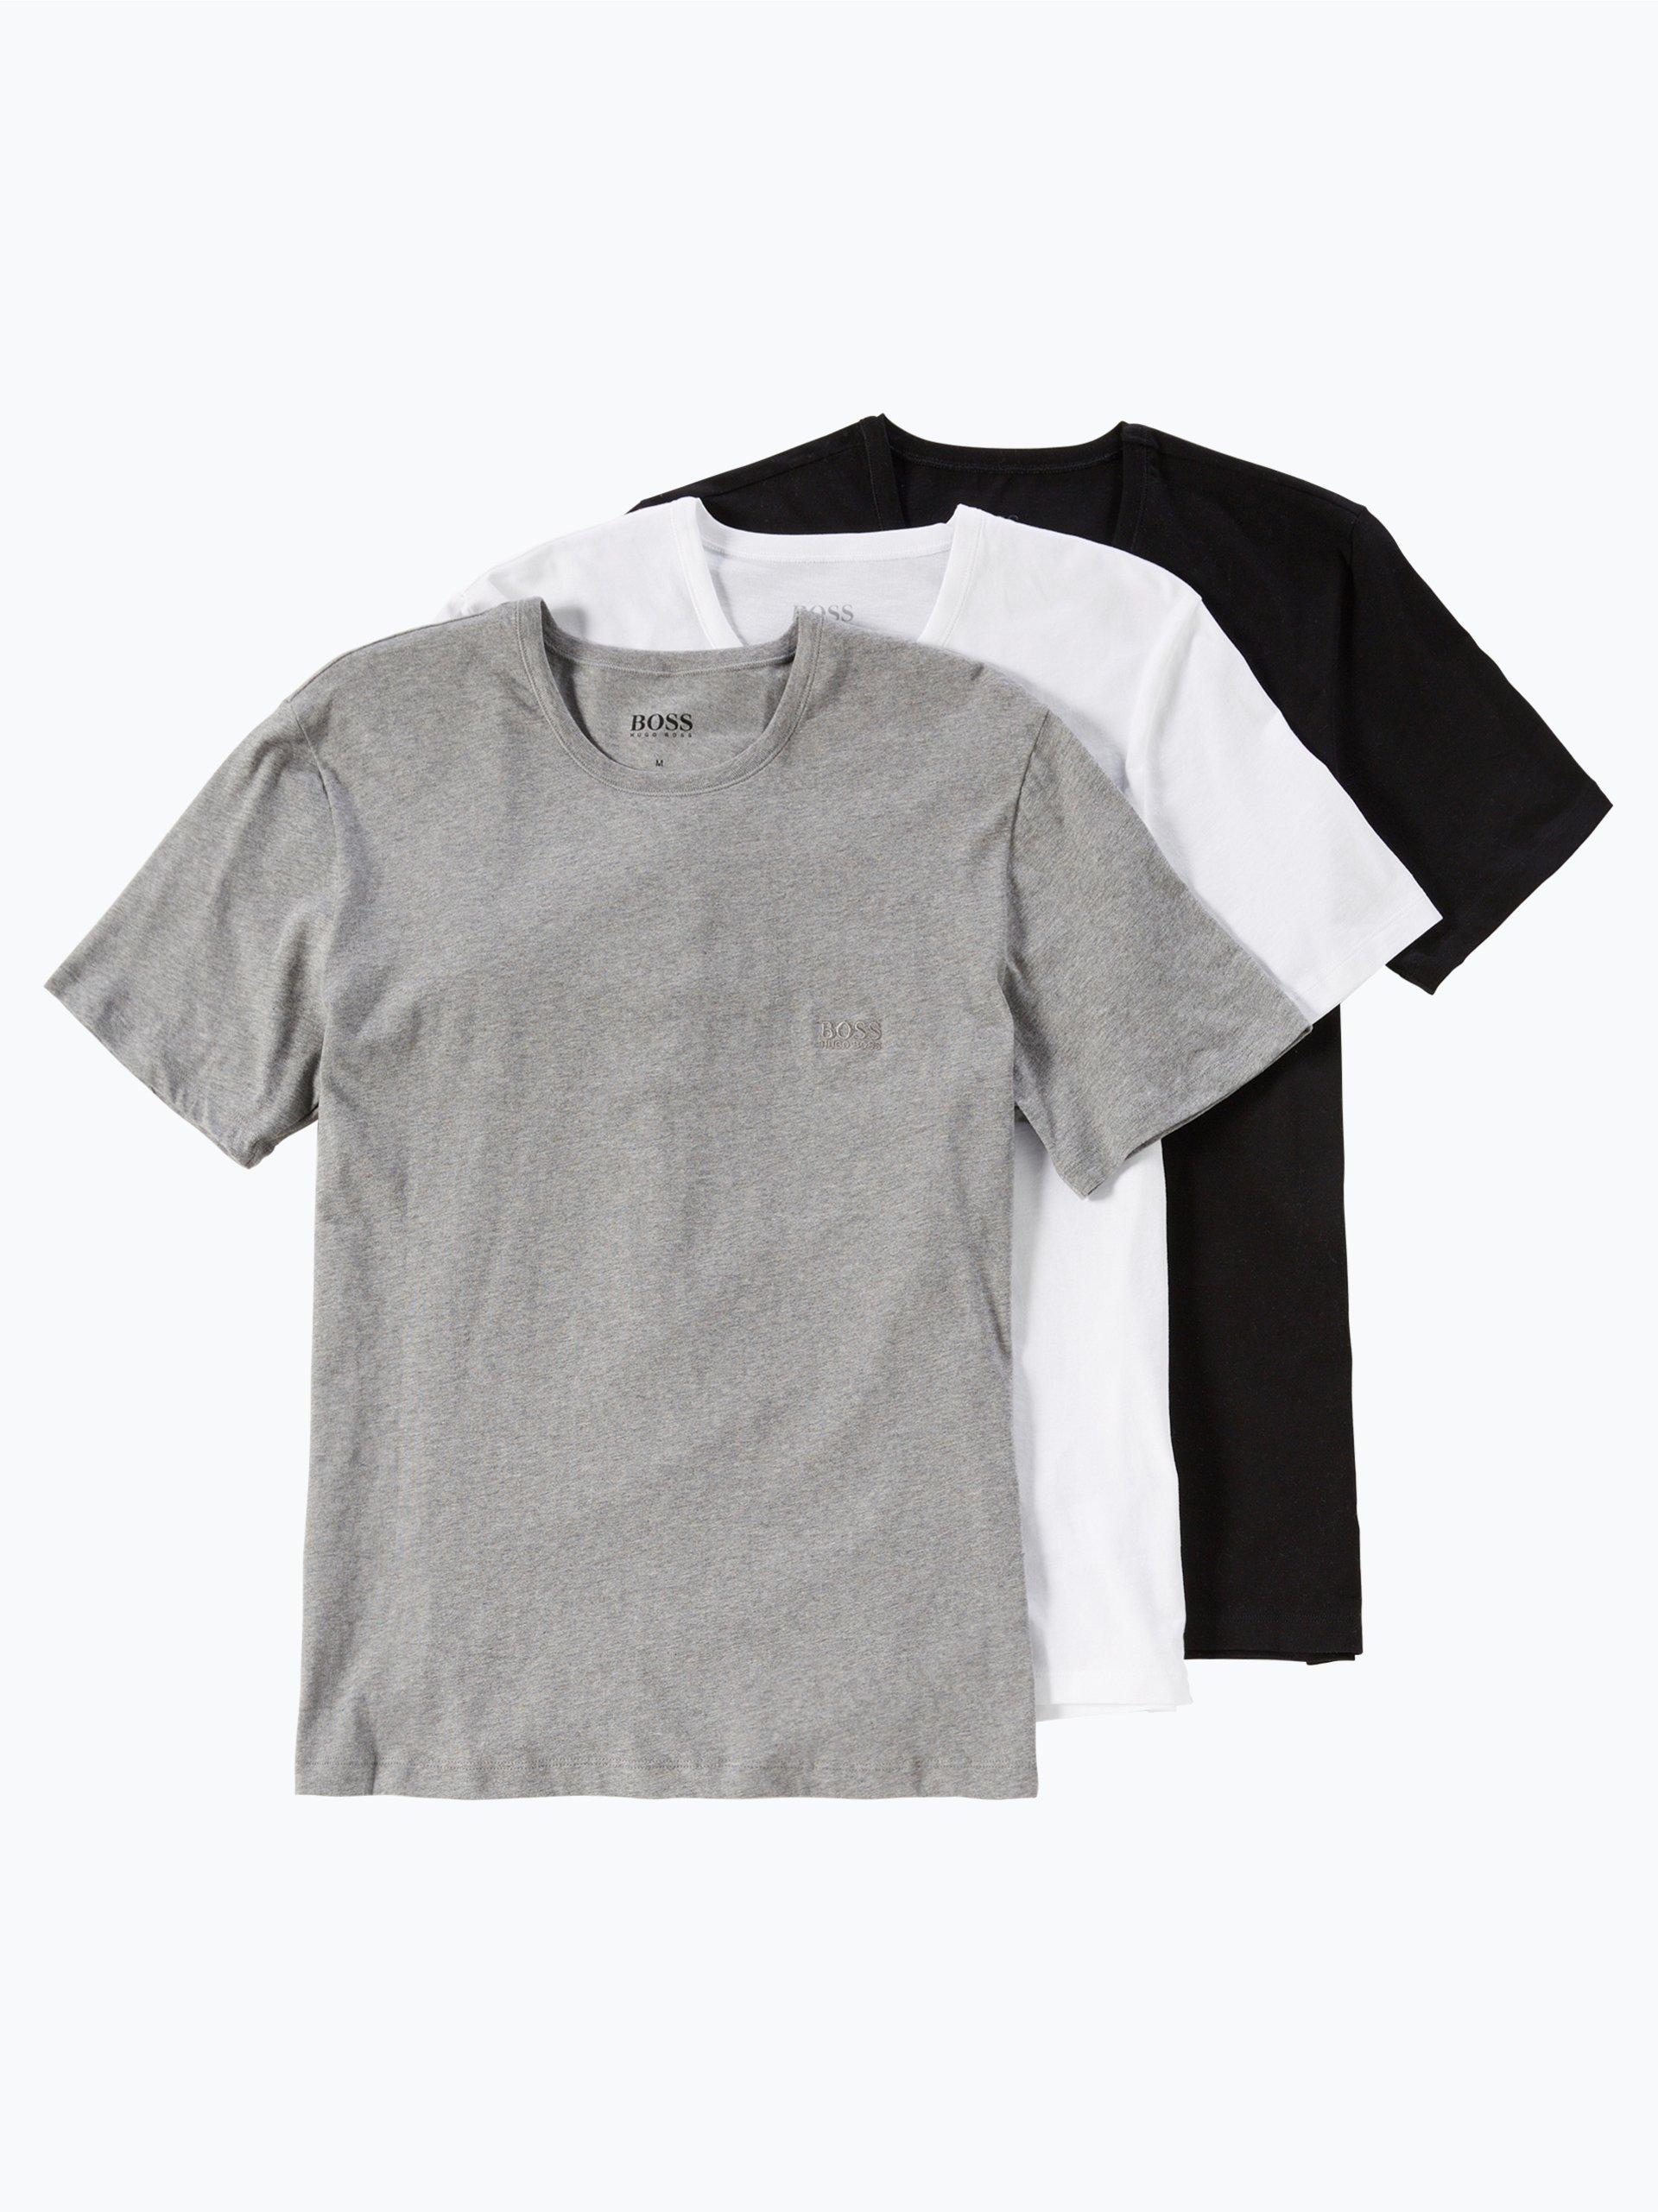 BOSS T-shirty męskie pakowane po 3 szt.